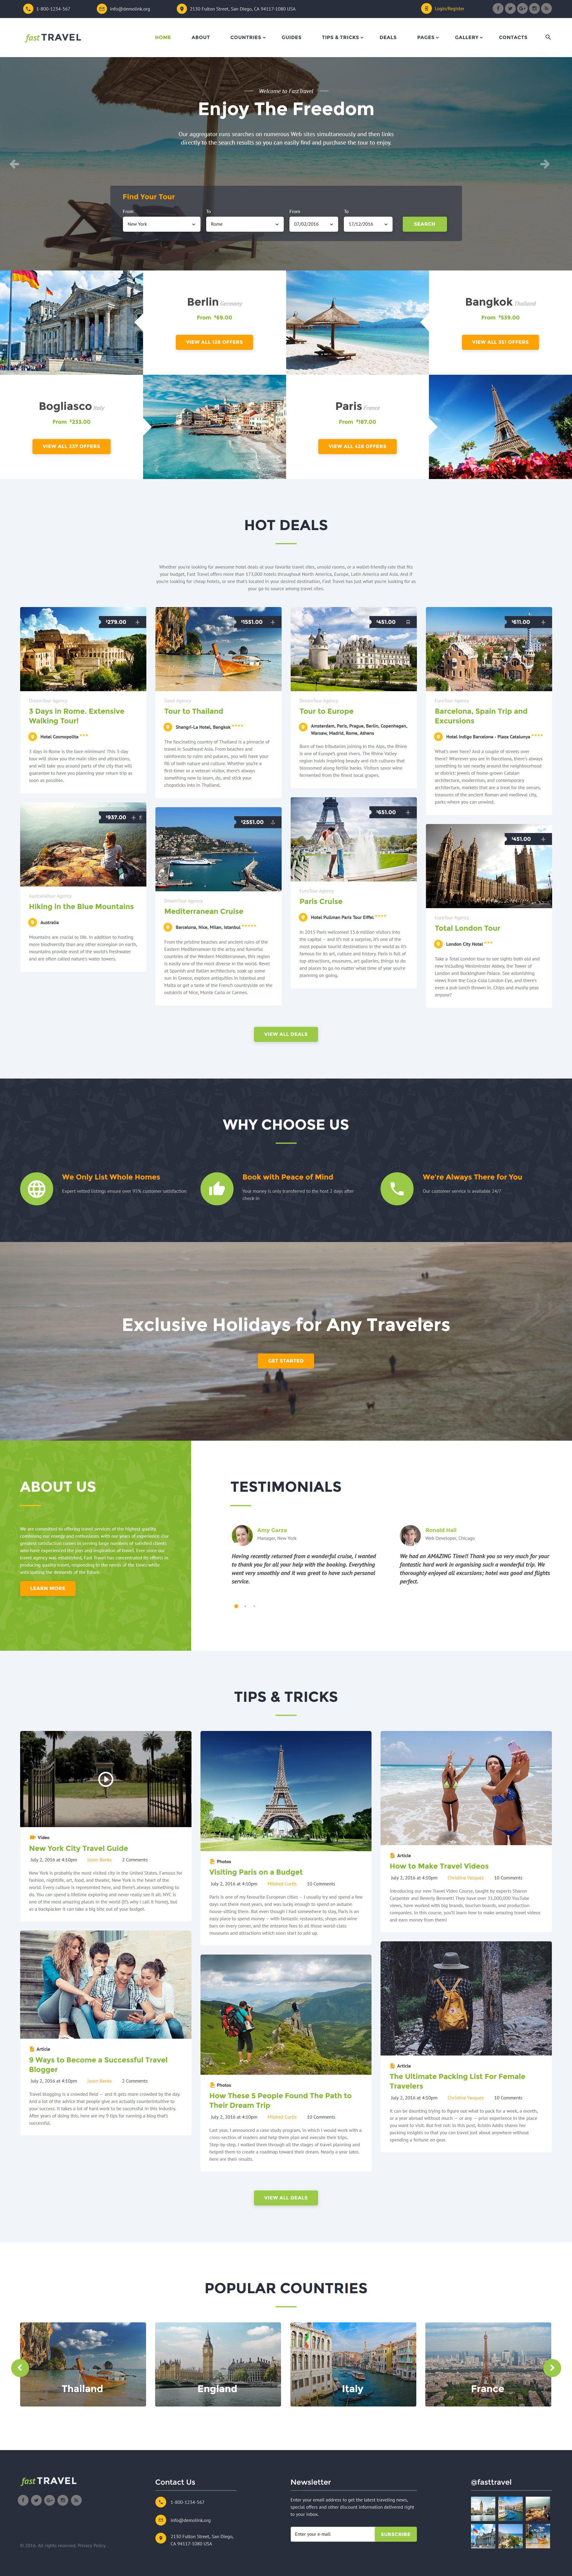 Travel Agency Responsive Website Template http://www.templatemonster ...